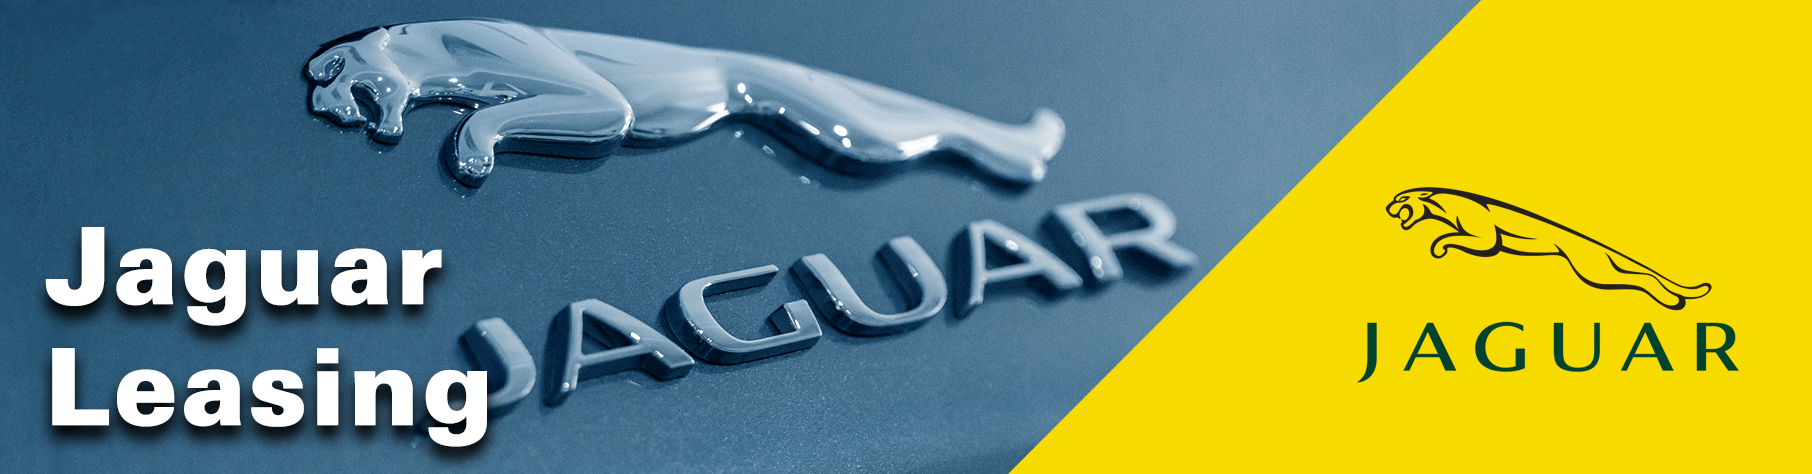 JAGUAR-Leasing für Ihr Business - Unsere JAGUAR-Leasing-Bestseller